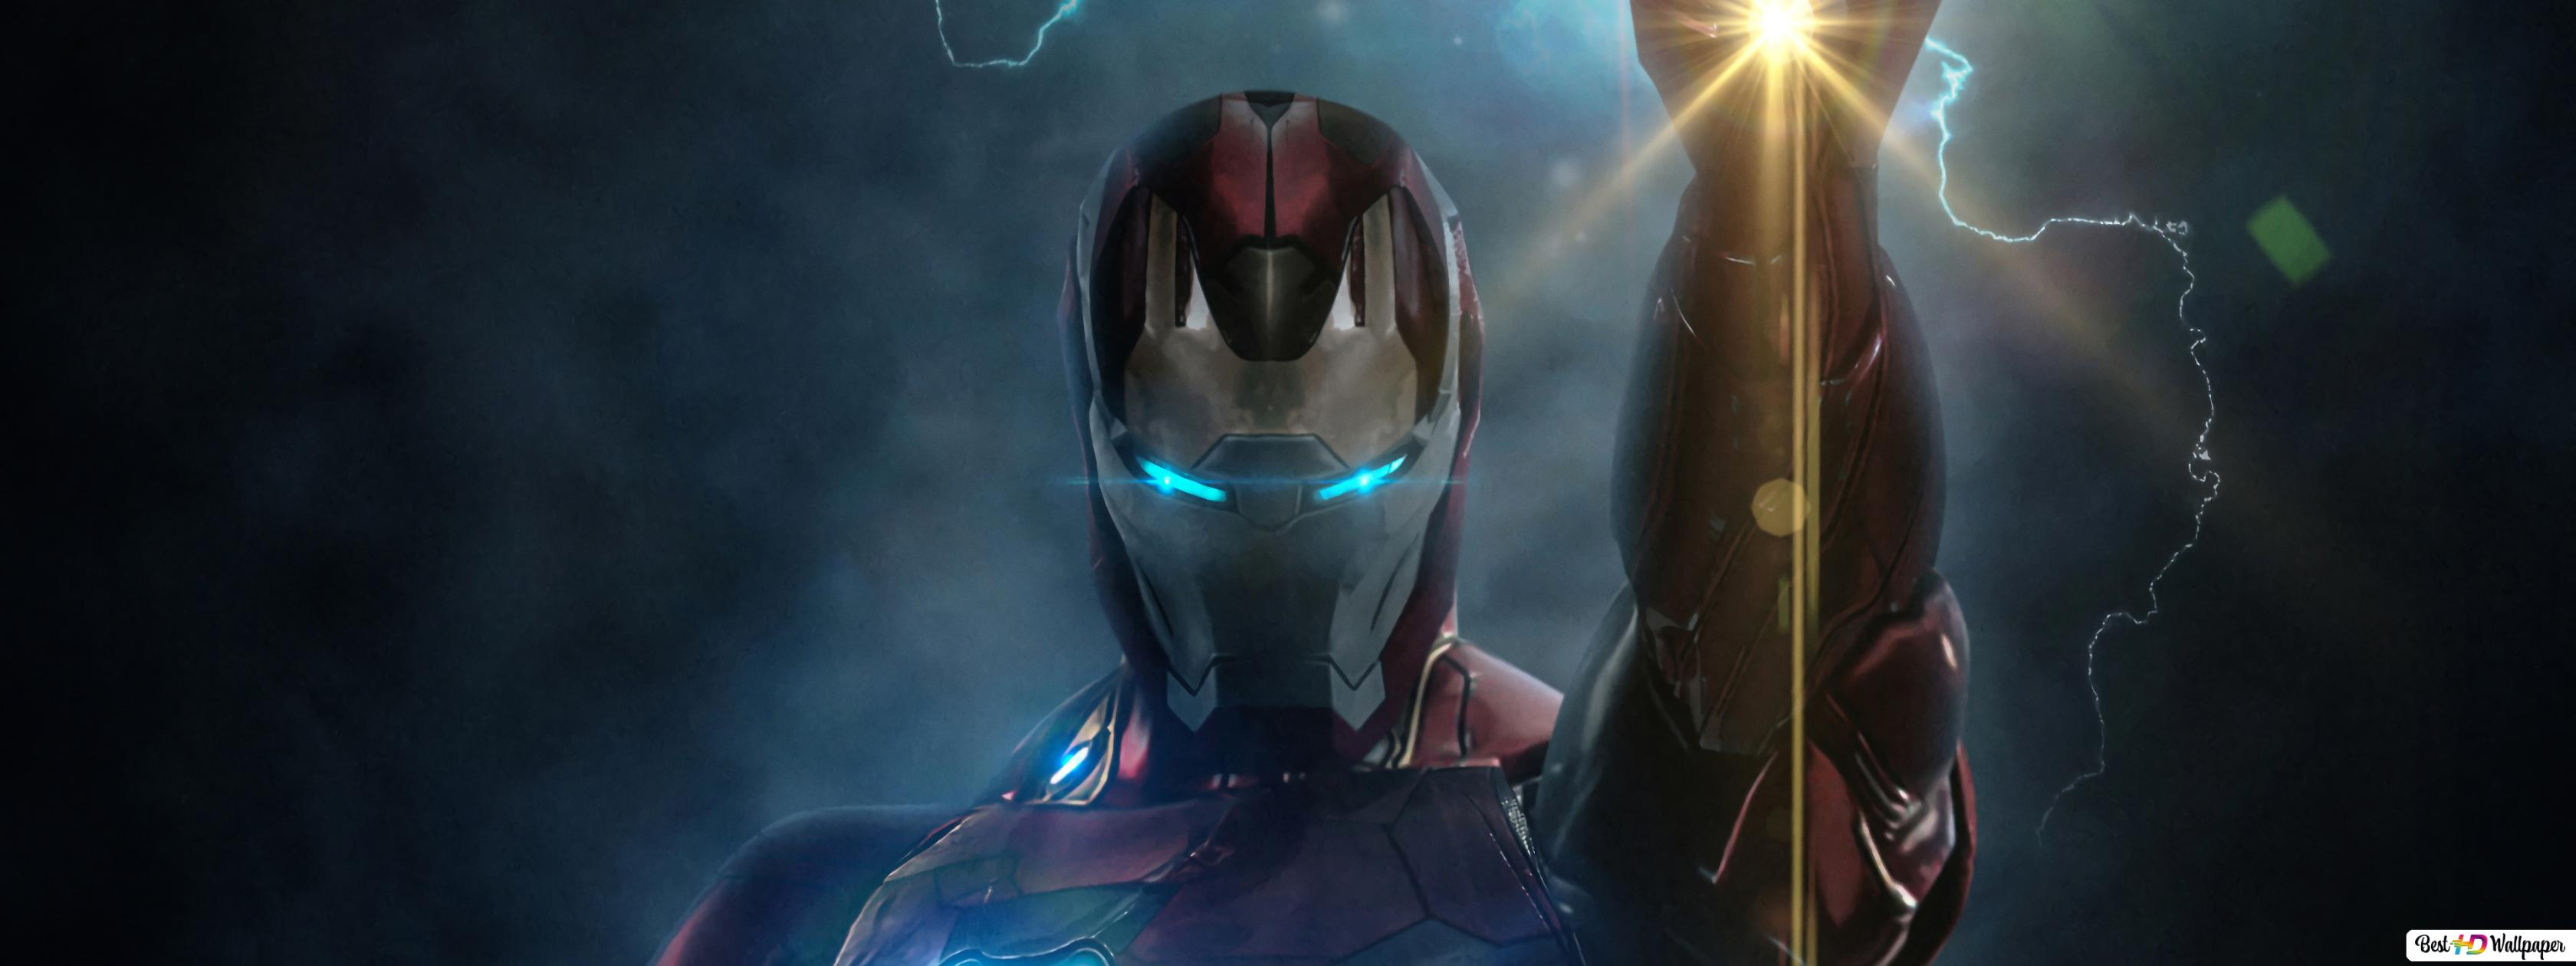 Avengers Endgame Movie Iron Man Powers Hd Wallpaper Download